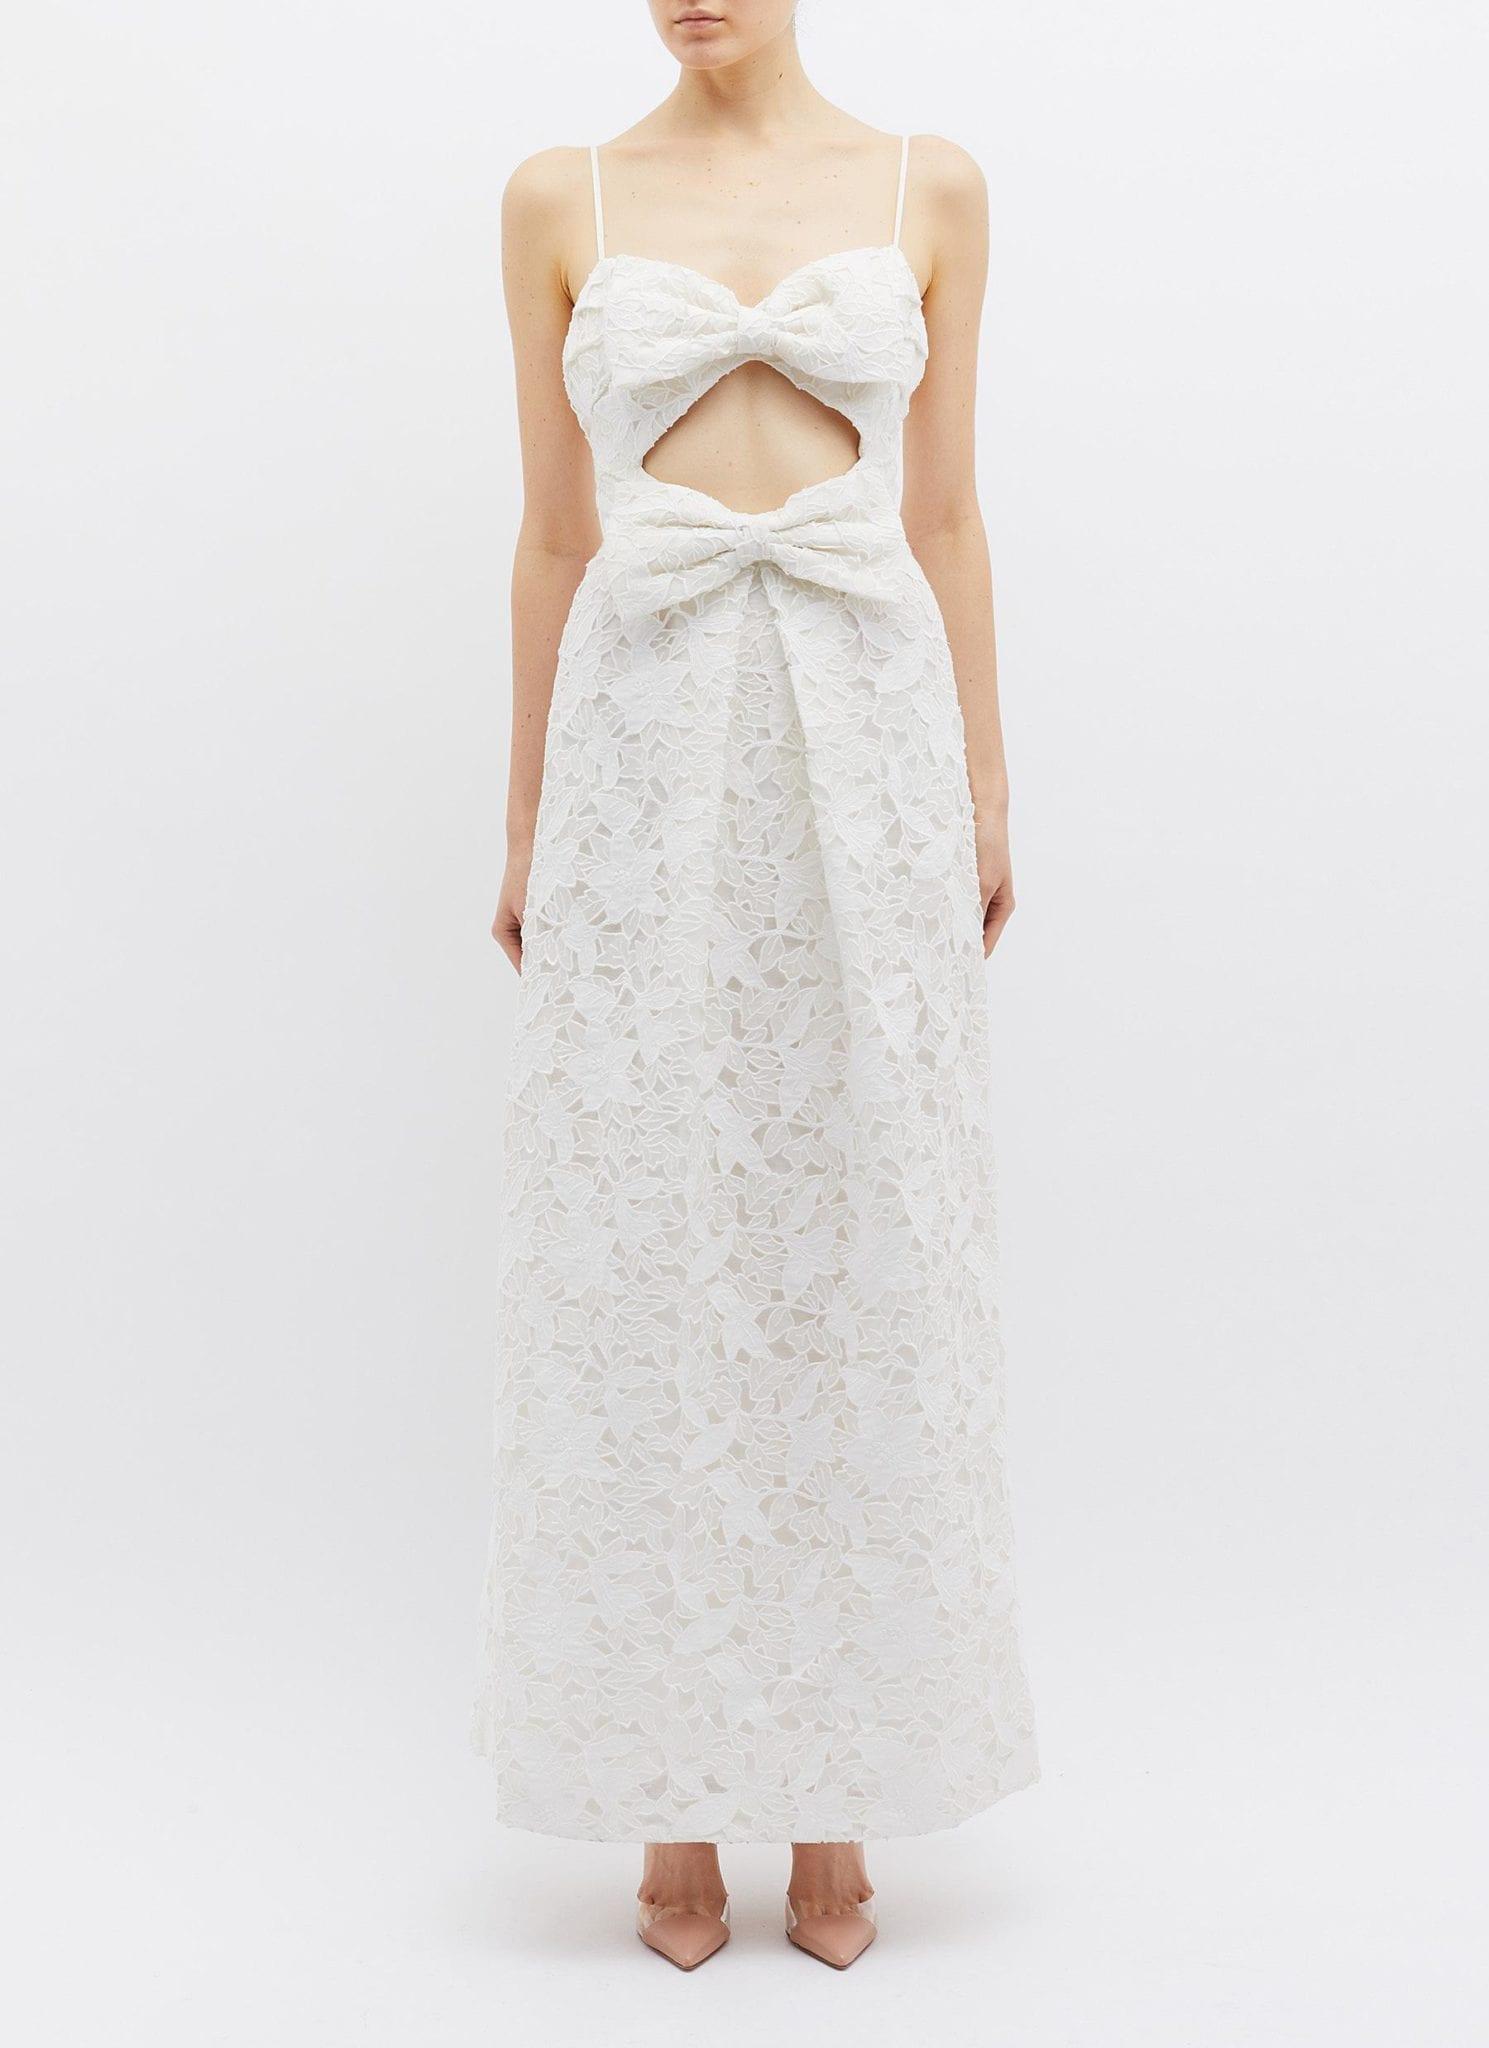 ZIMMERMANN 'Corsage' Cutout Bow Front Guipure Lace Sleeveless White Dress